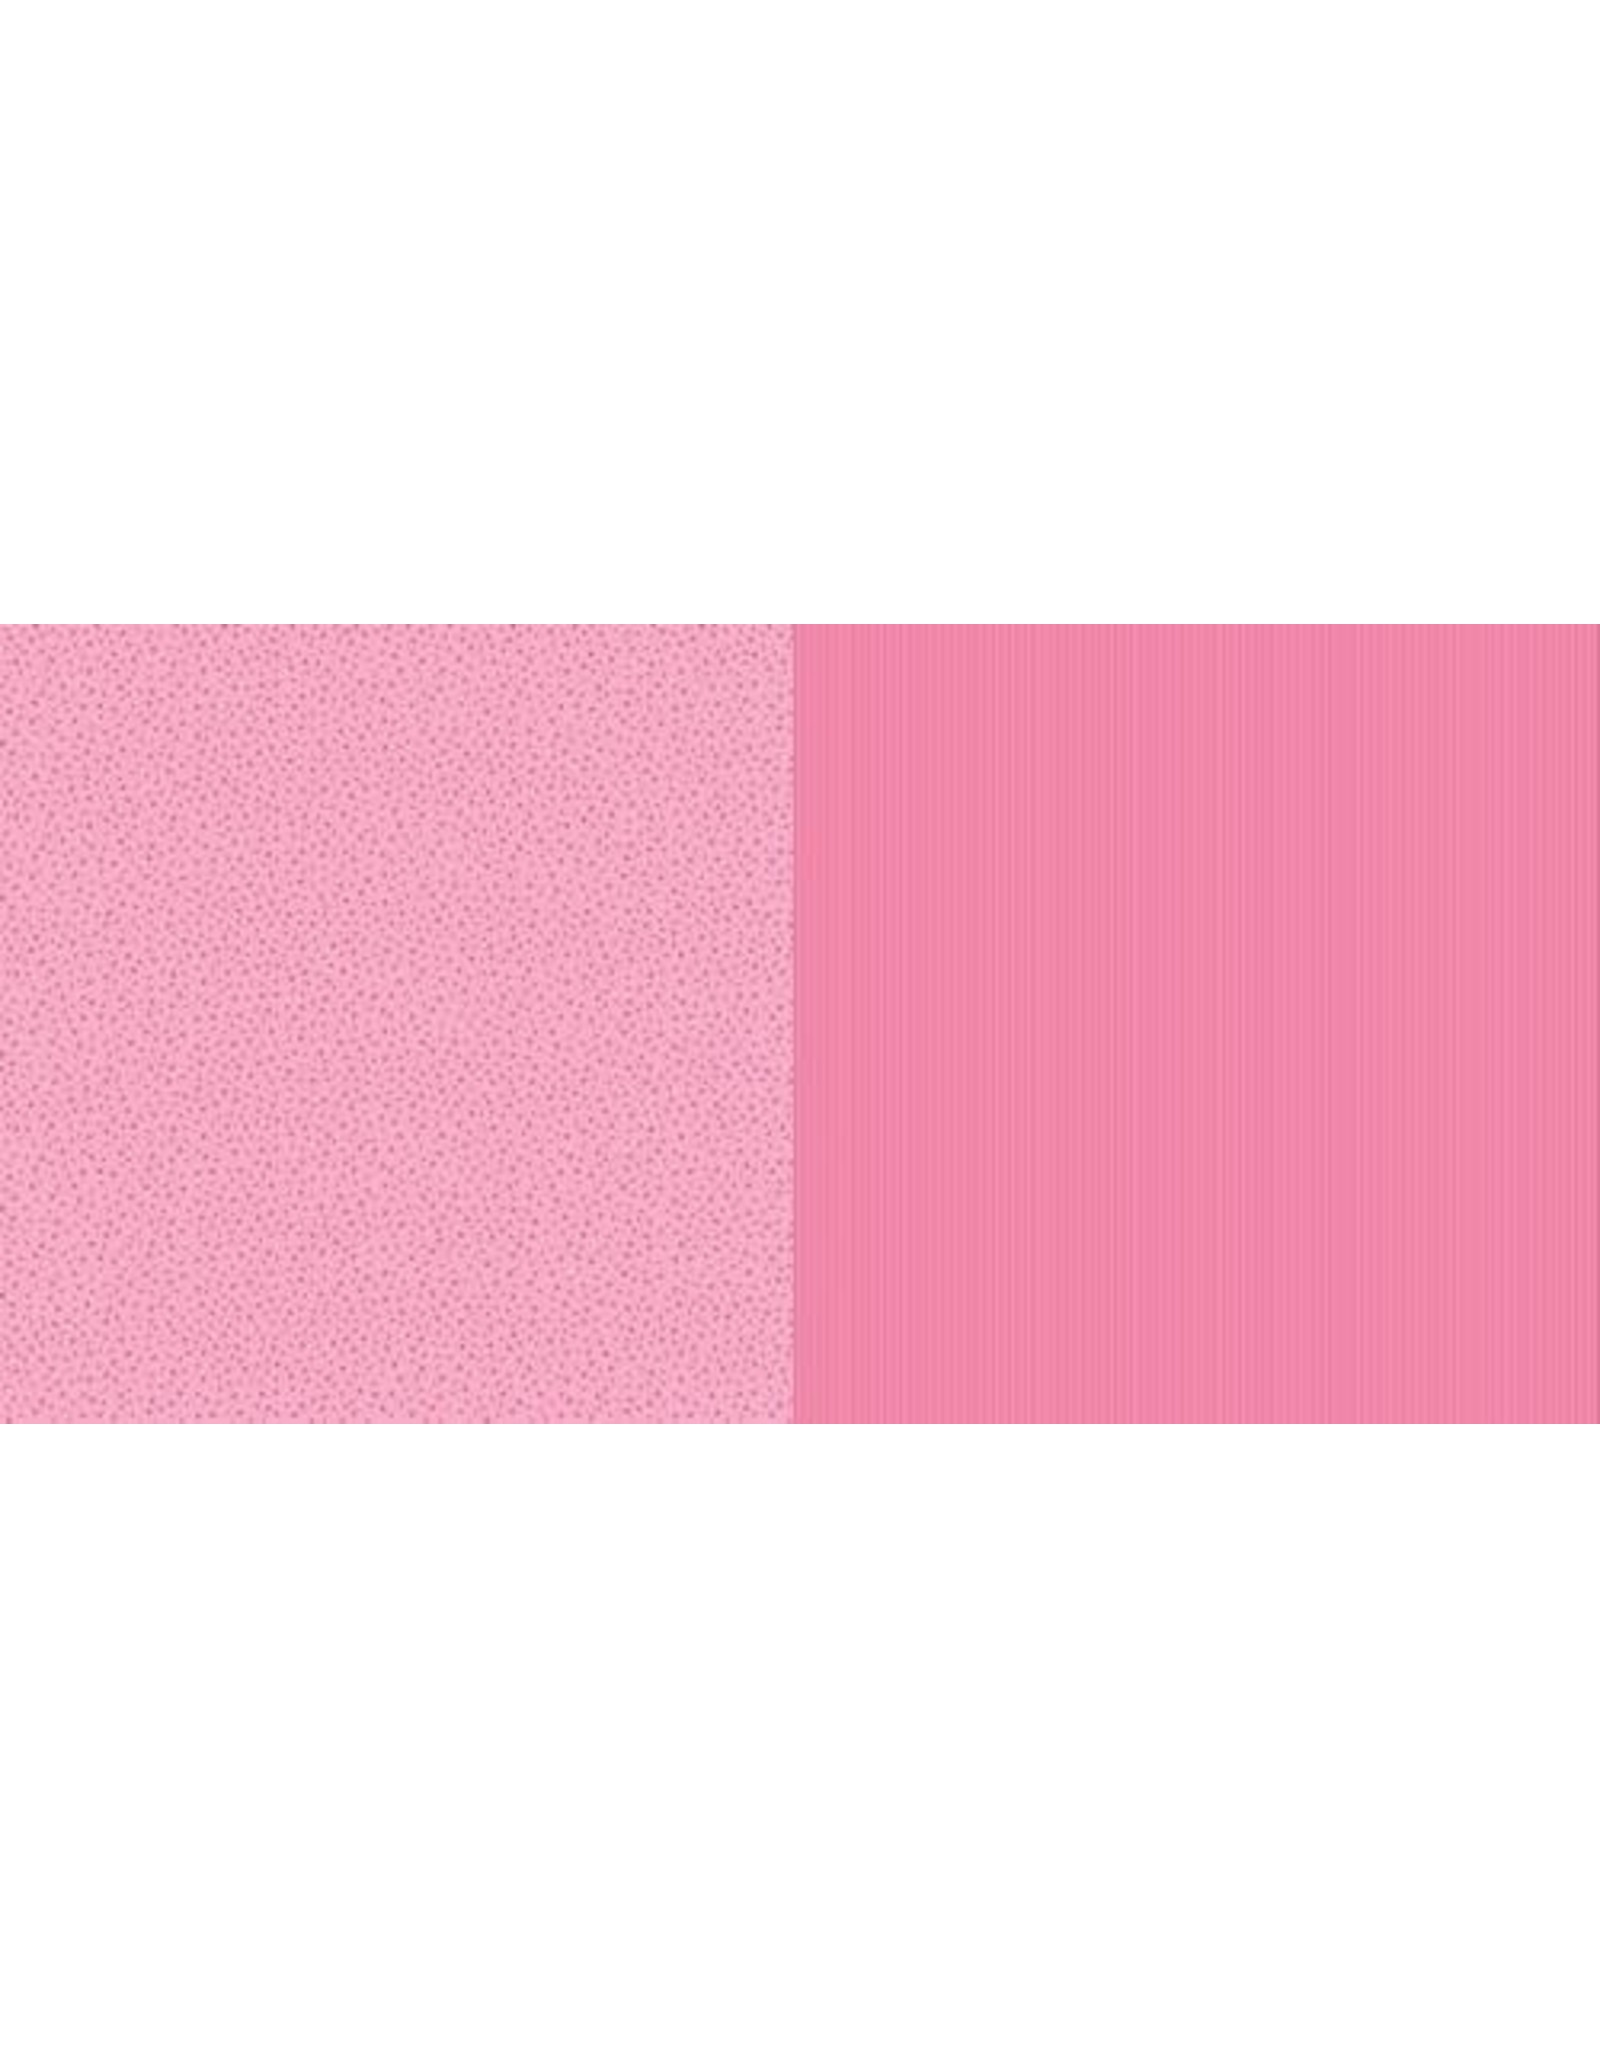 Dini Design Dini Design Scrappapier 10 vl Streep ster - Watermeloen 30,5x30,5cm #1001